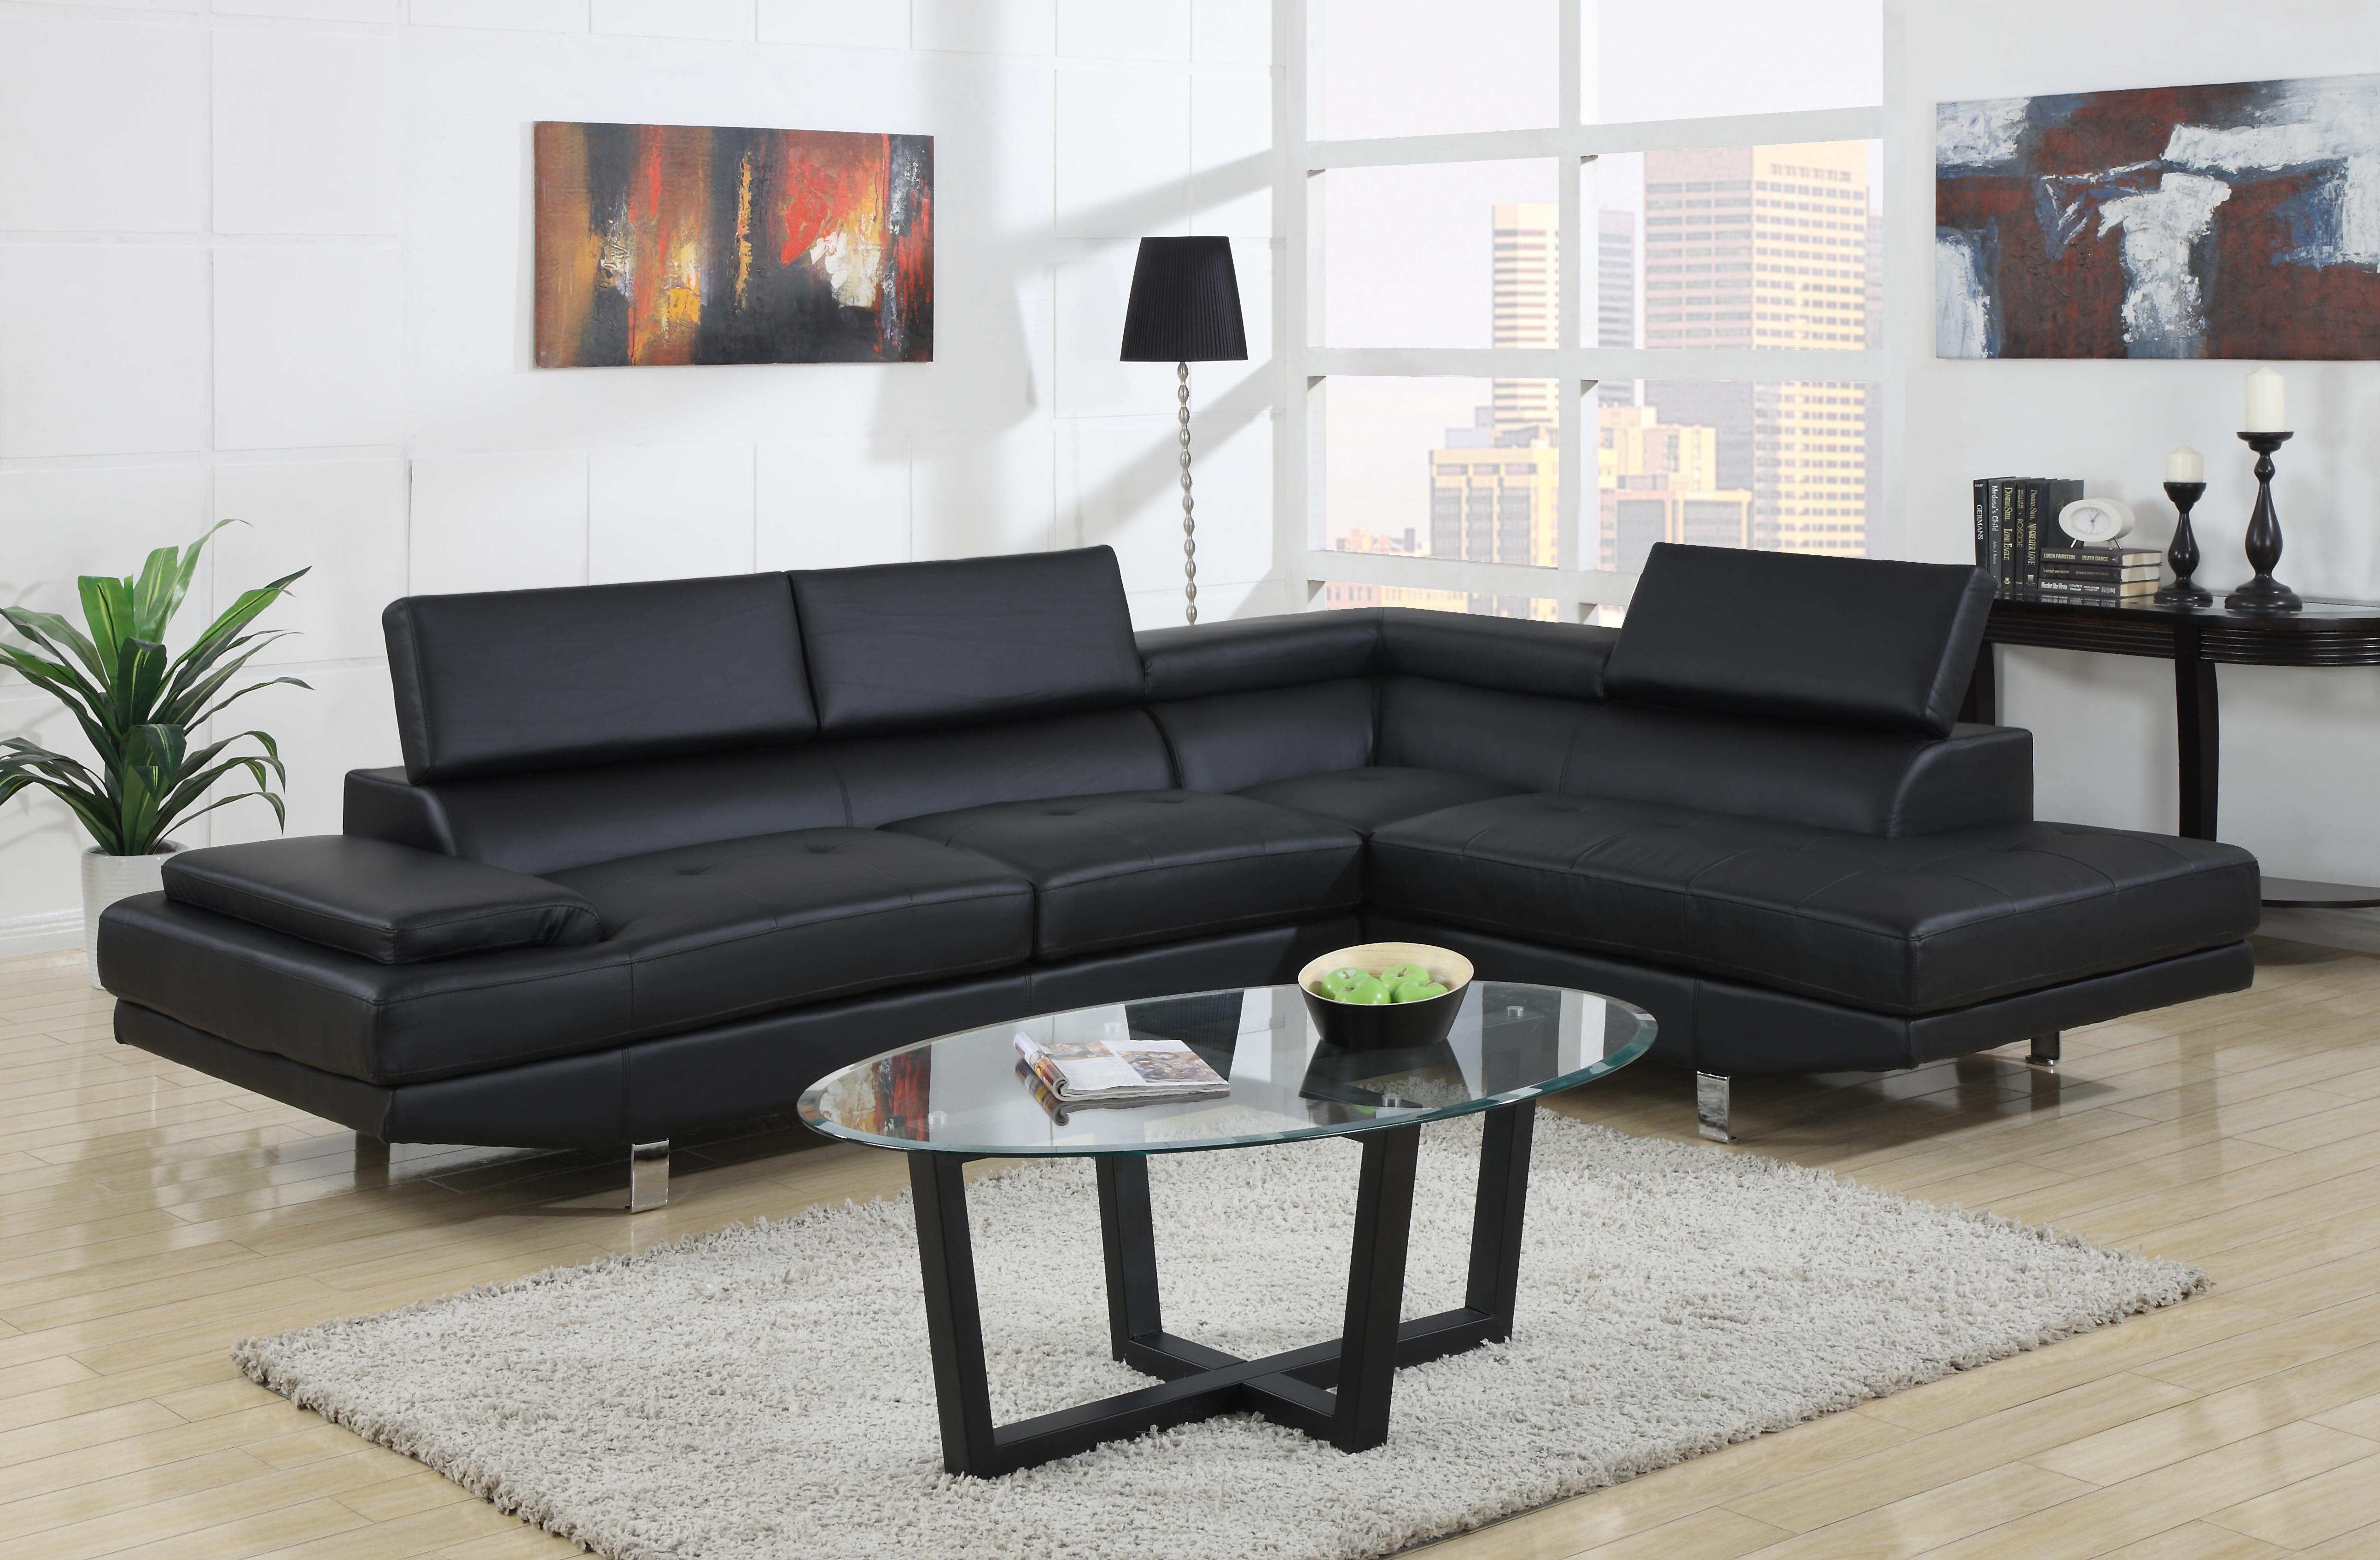 Marvelous ... Baxton Studio Selma Black Leather Modern Sectional Sofa    BSOIDS077P SEC RFC Black